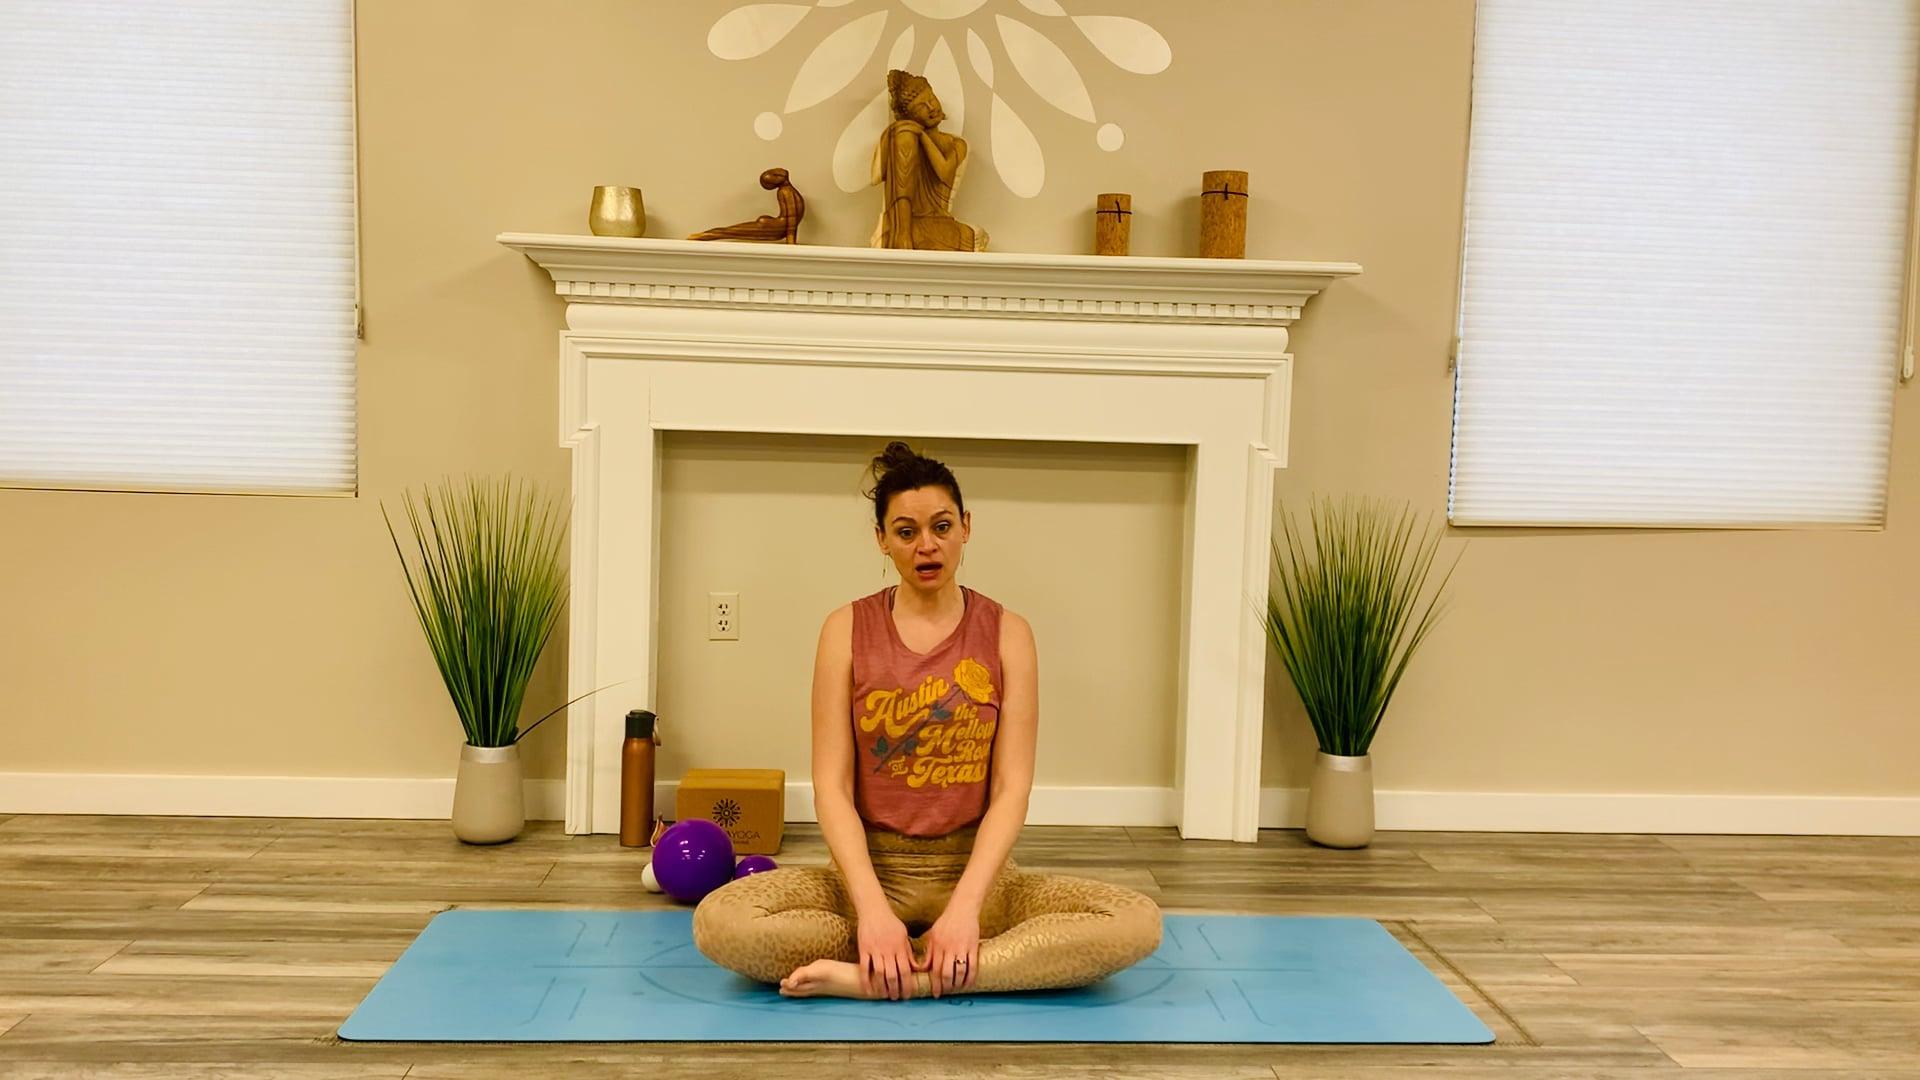 Nadi Method Relax & Massage 4-10-21 - 30 Minutes.mov